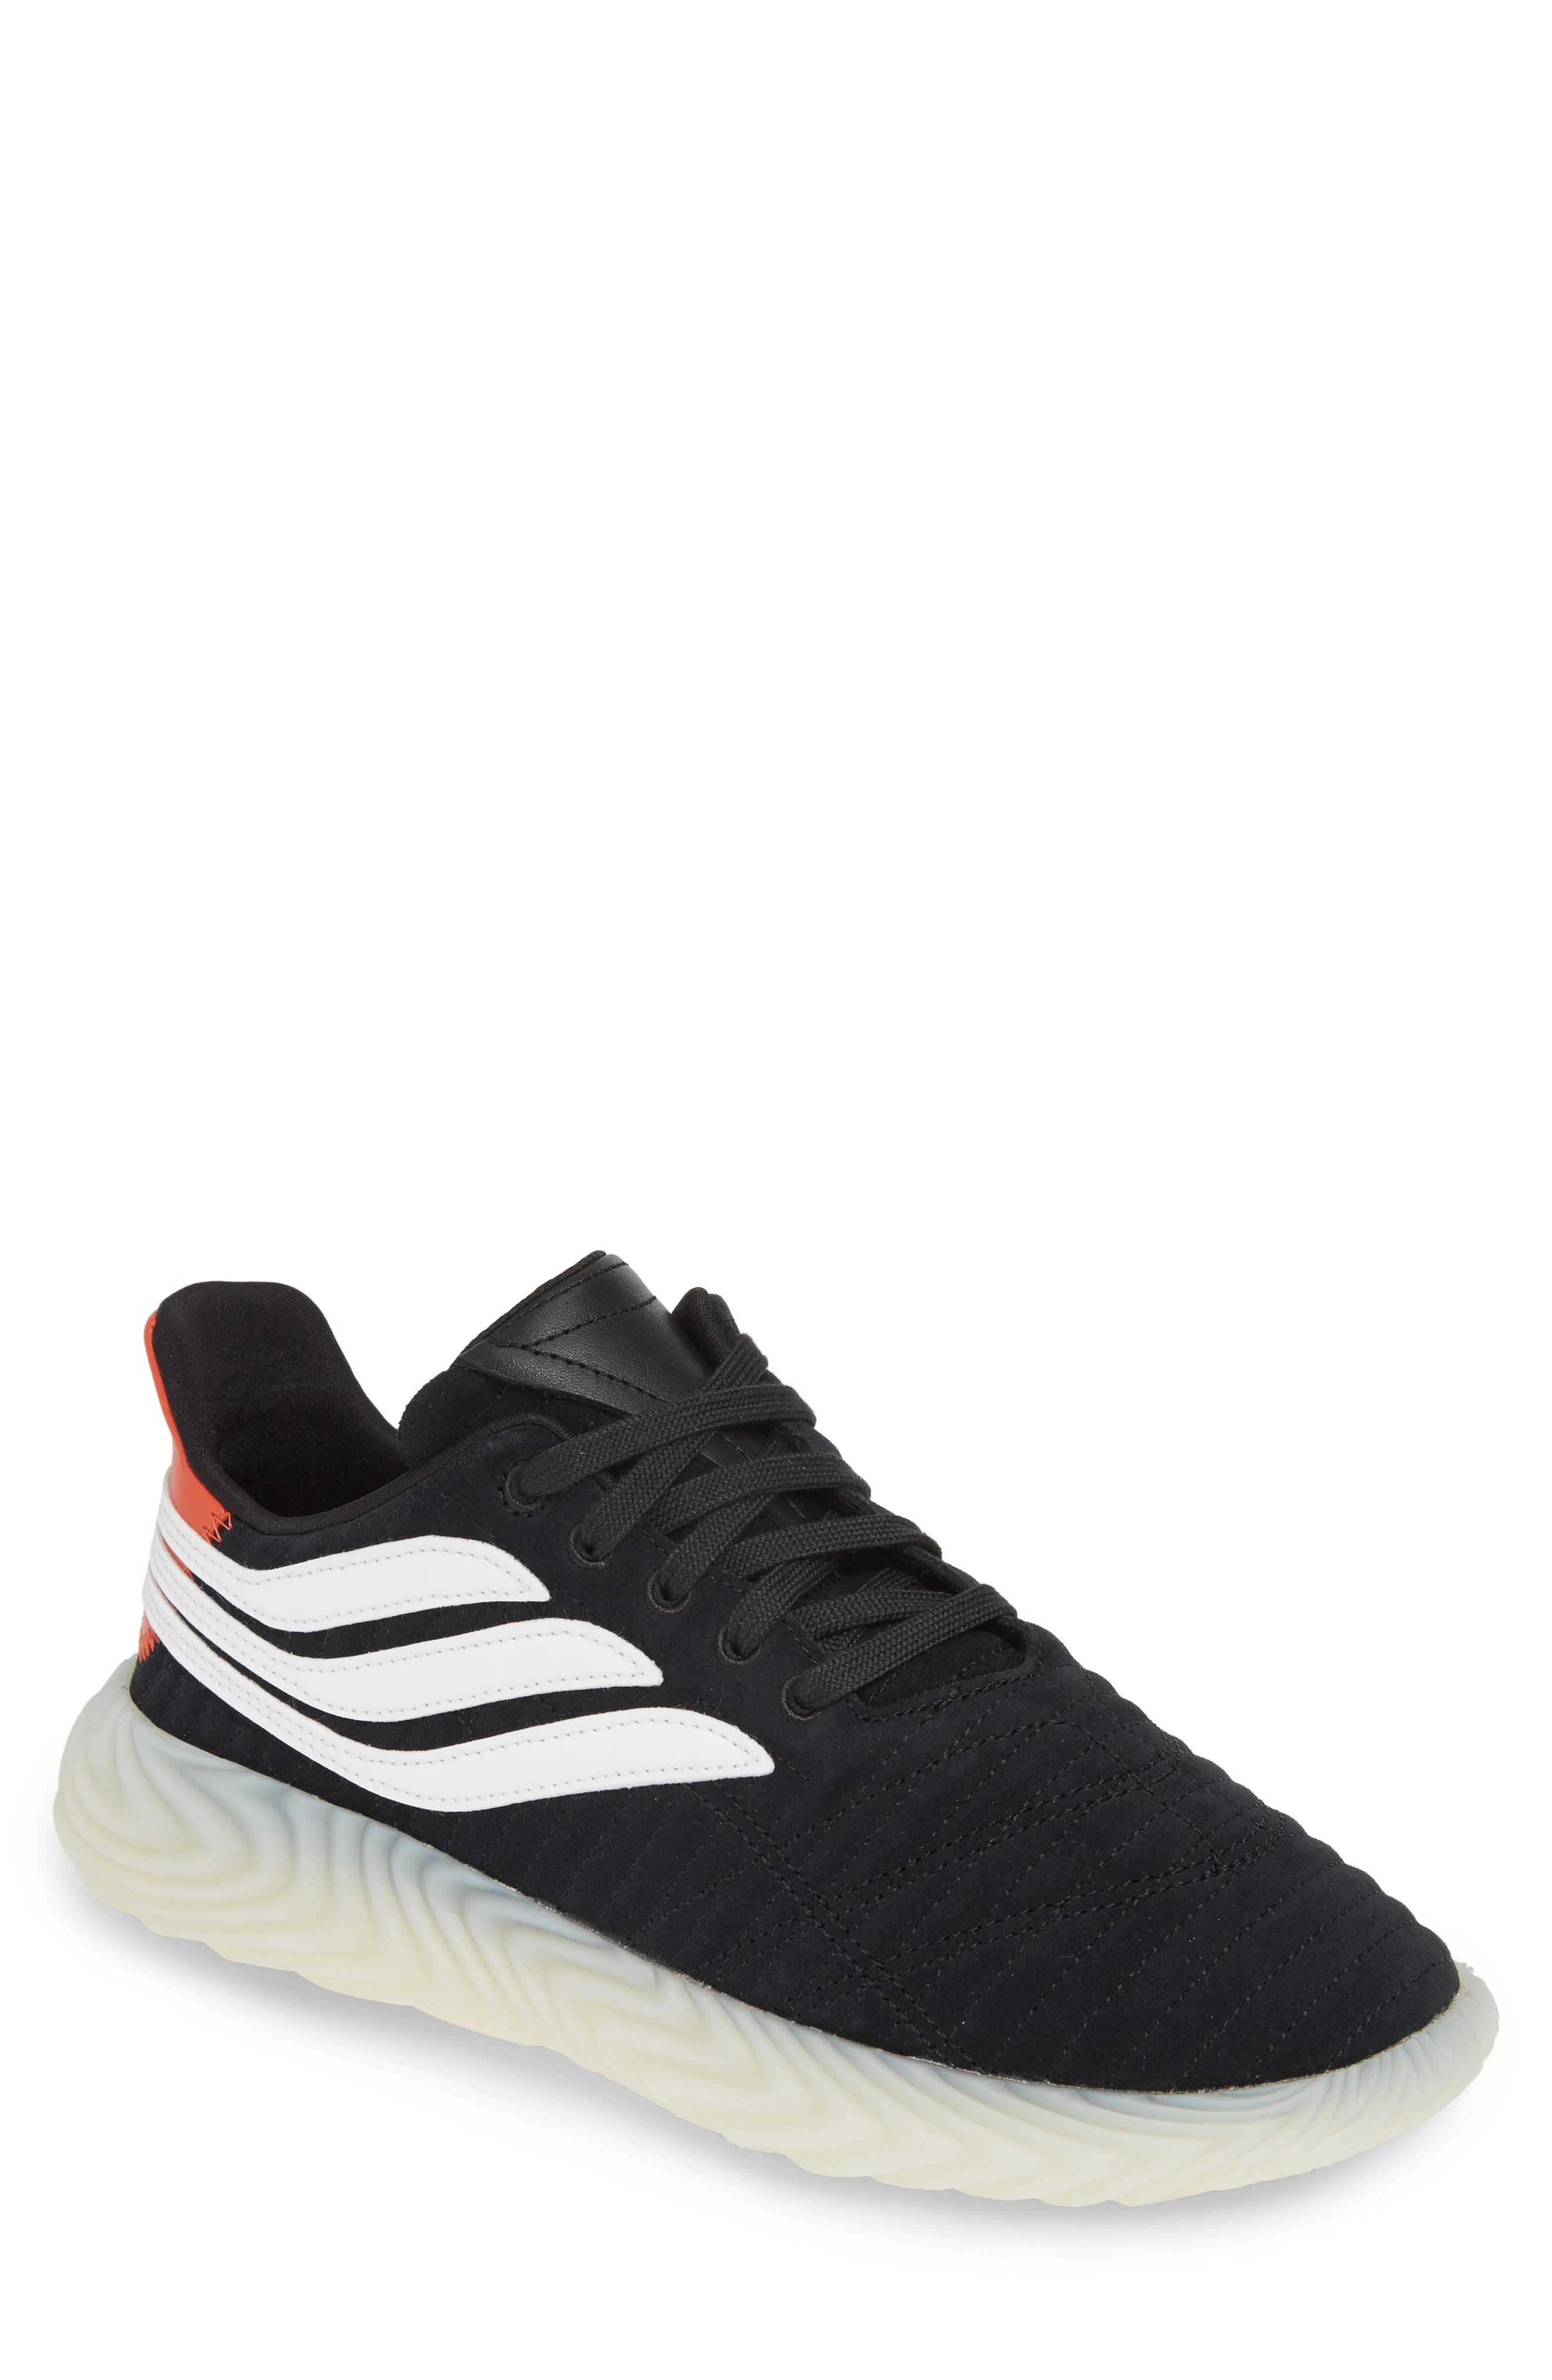 Sobakov Sneaker, Main, color, CORE BLACK/ OFF WHITE/ AMBER